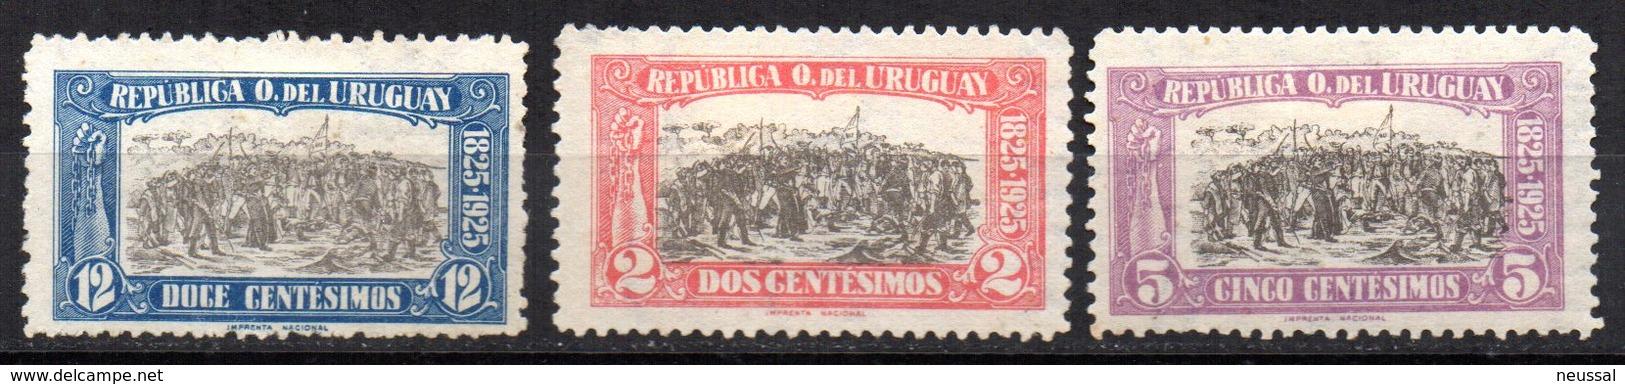 Serie Nº 298/300 Uruguay - Uruguay